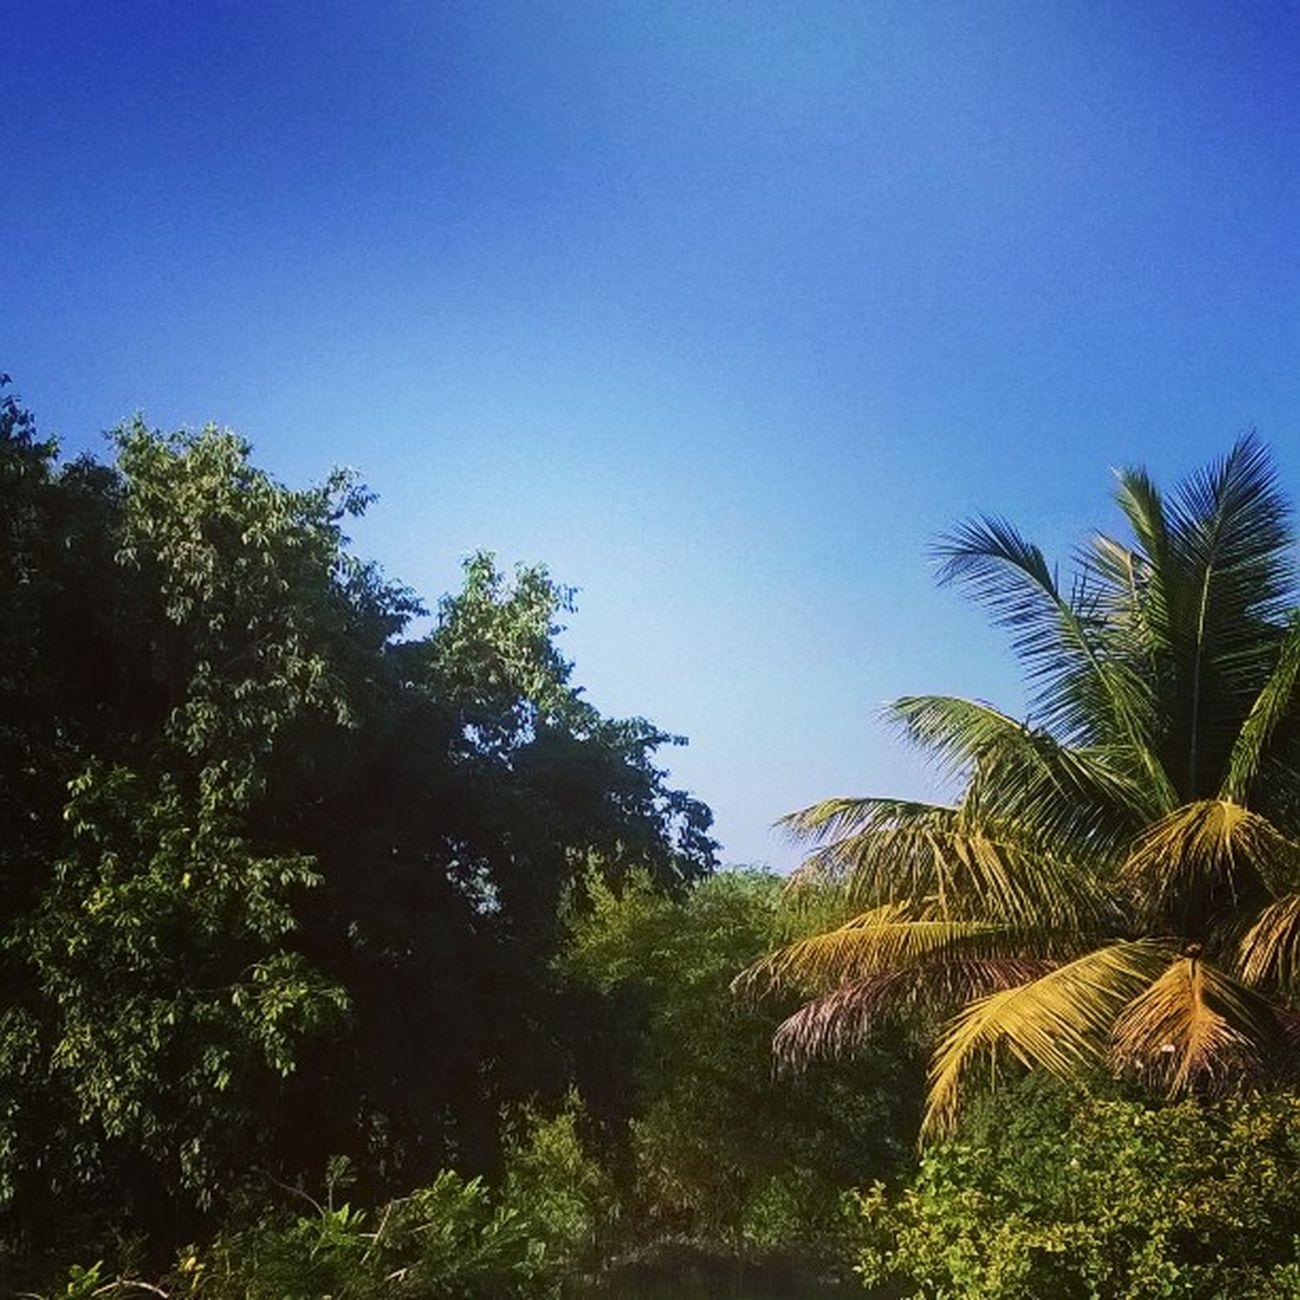 Sunnyday CARIBBEANLIFE Trini2dbone Nature